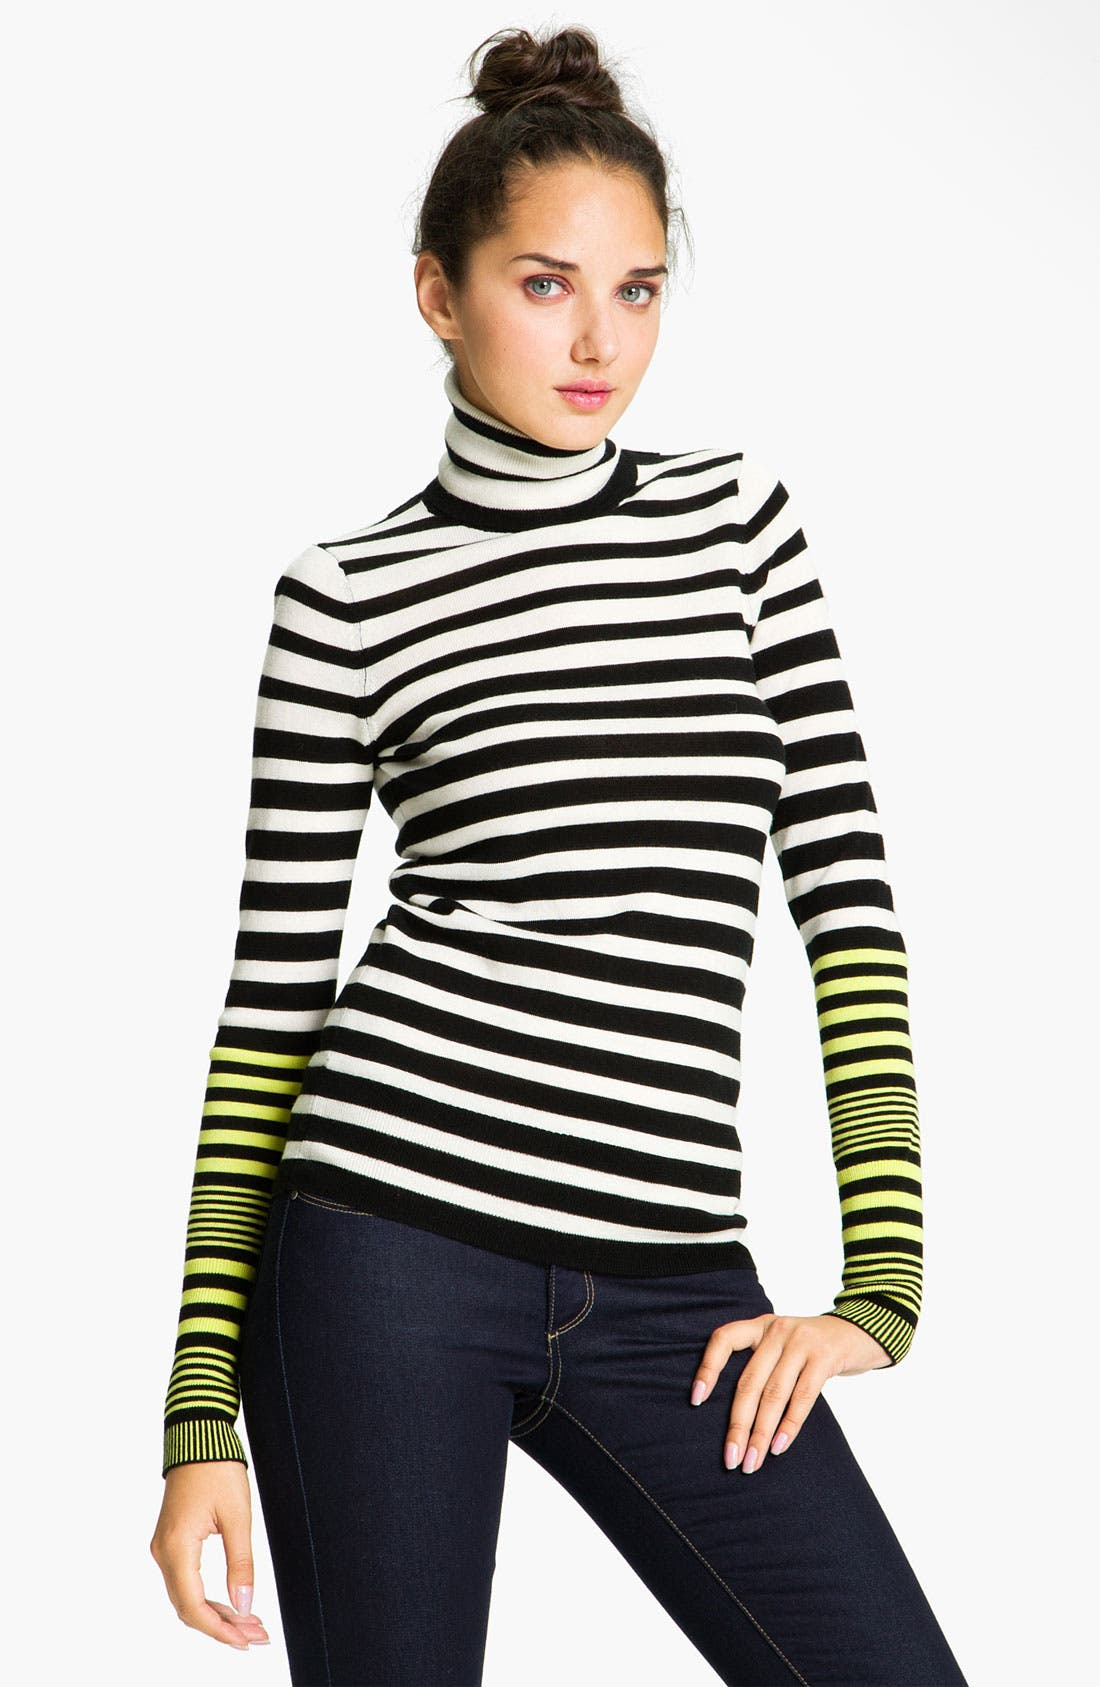 Alternate Image 1 Selected - Juicy Couture Stripe Turtleneck